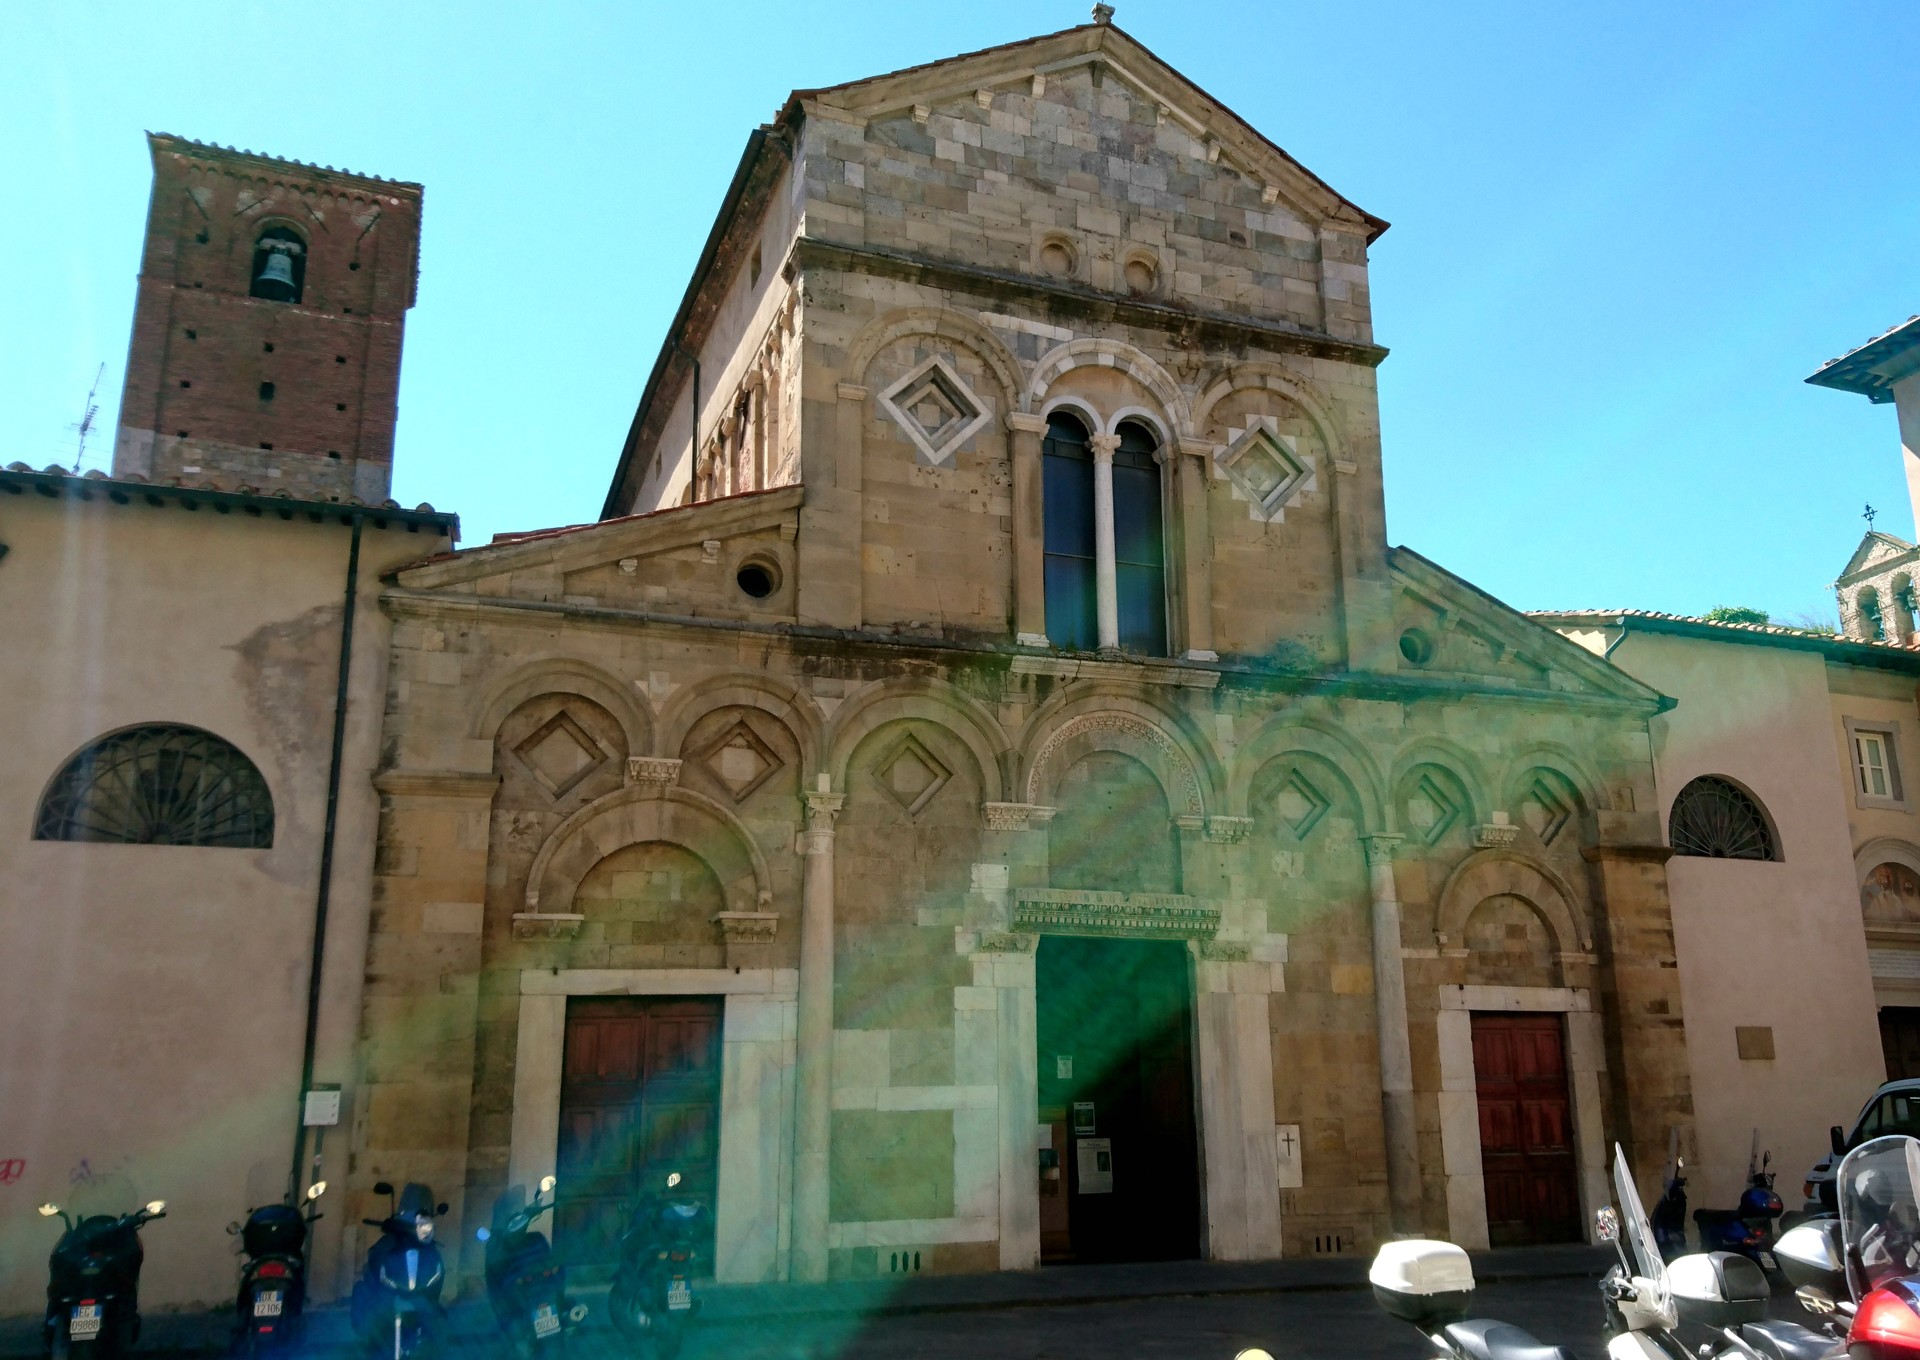 churches-beauty-1065f472e5722079c84a433c